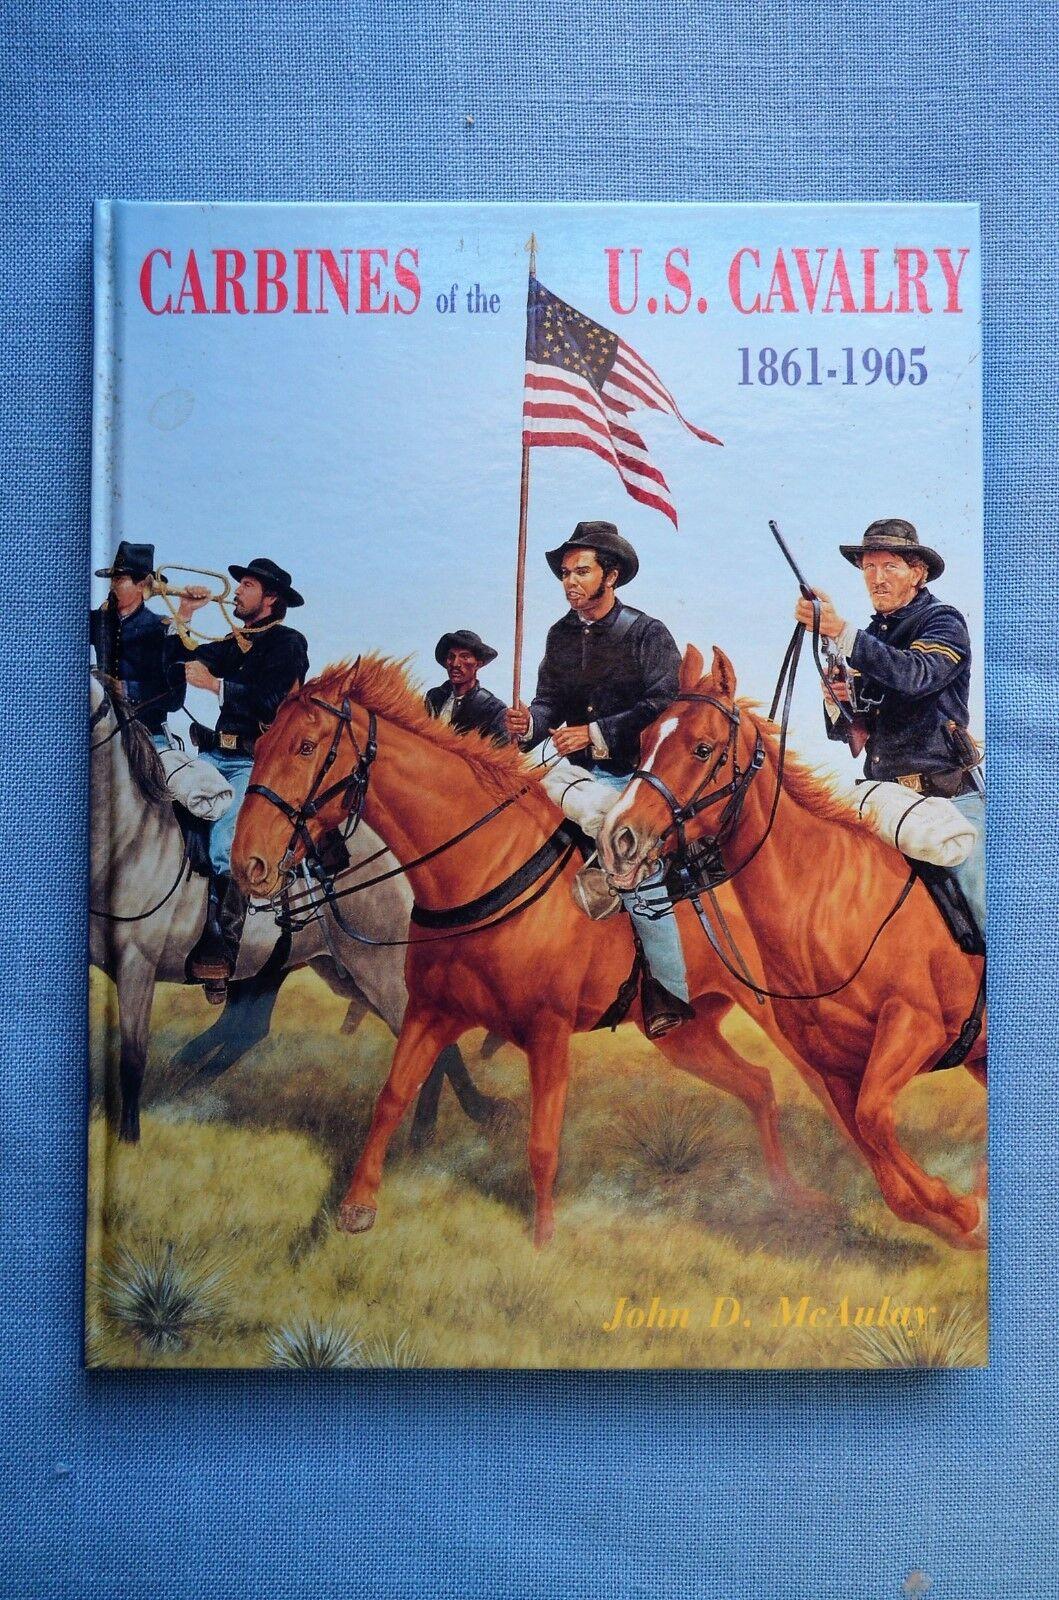 Carbines of the U.S. Cavalry McAulay 1861-1905, by John D. McAulay Cavalry 7ac98e